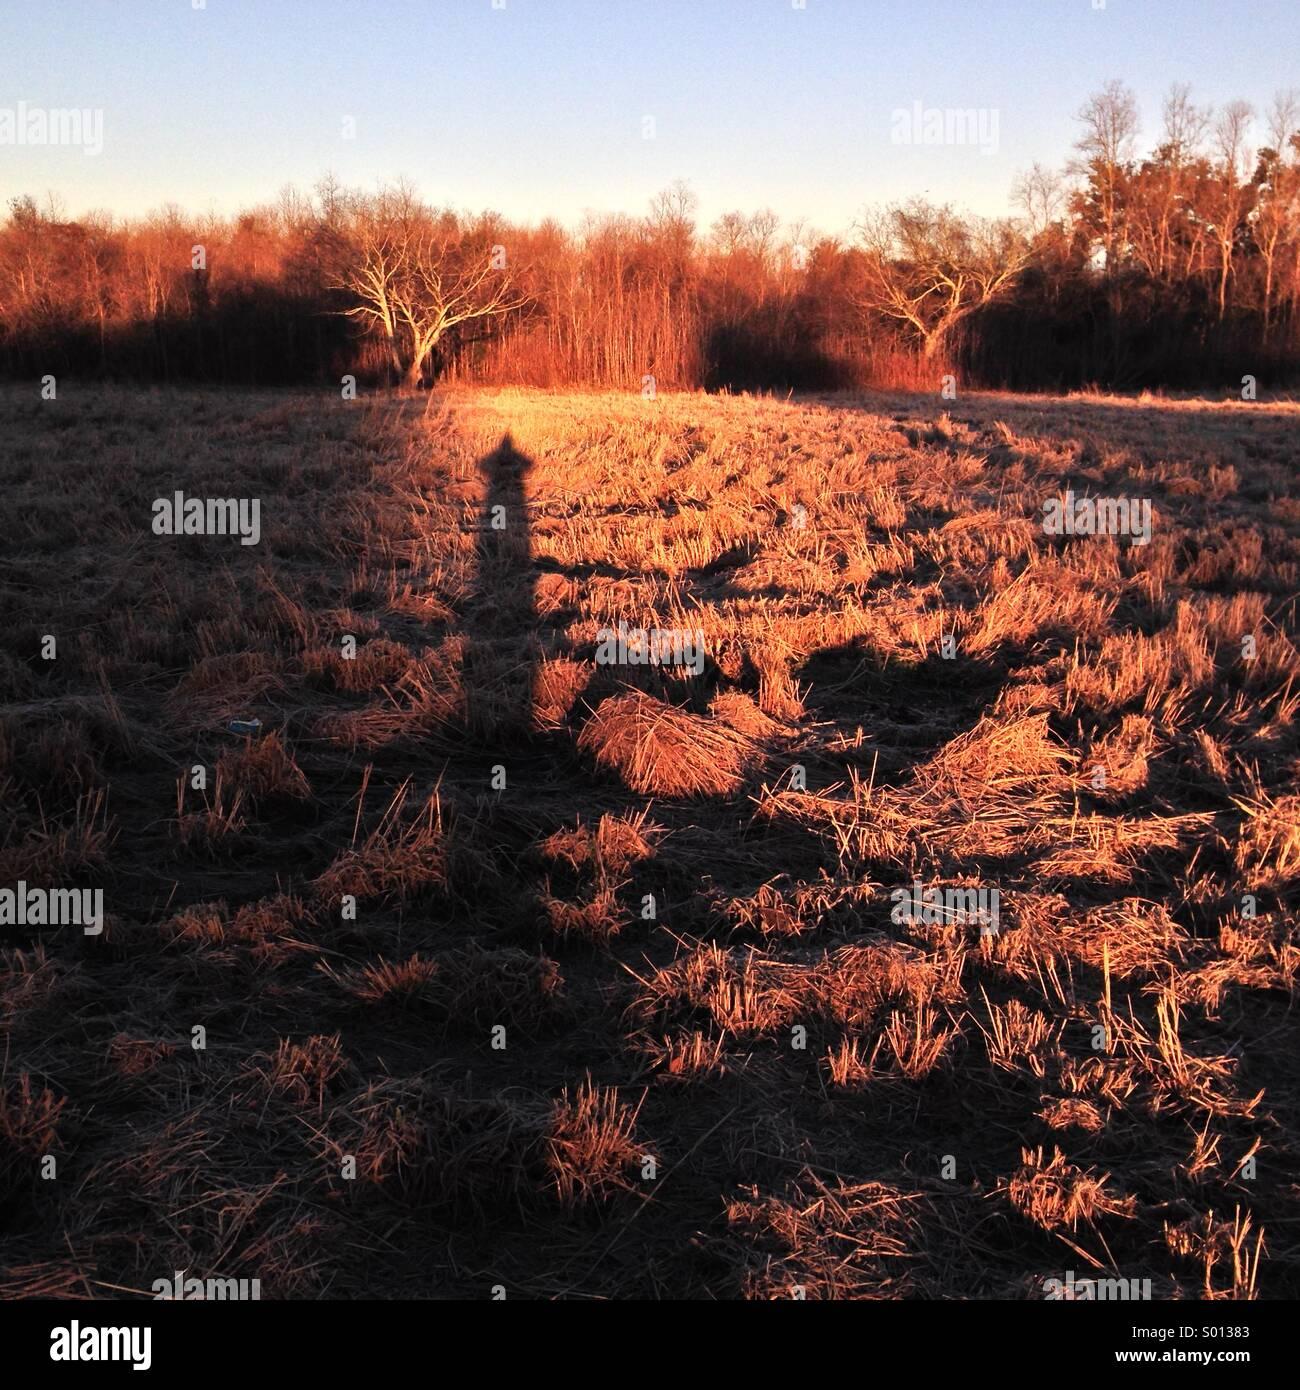 Tall dusk shadow over winter open fields. - Stock Image